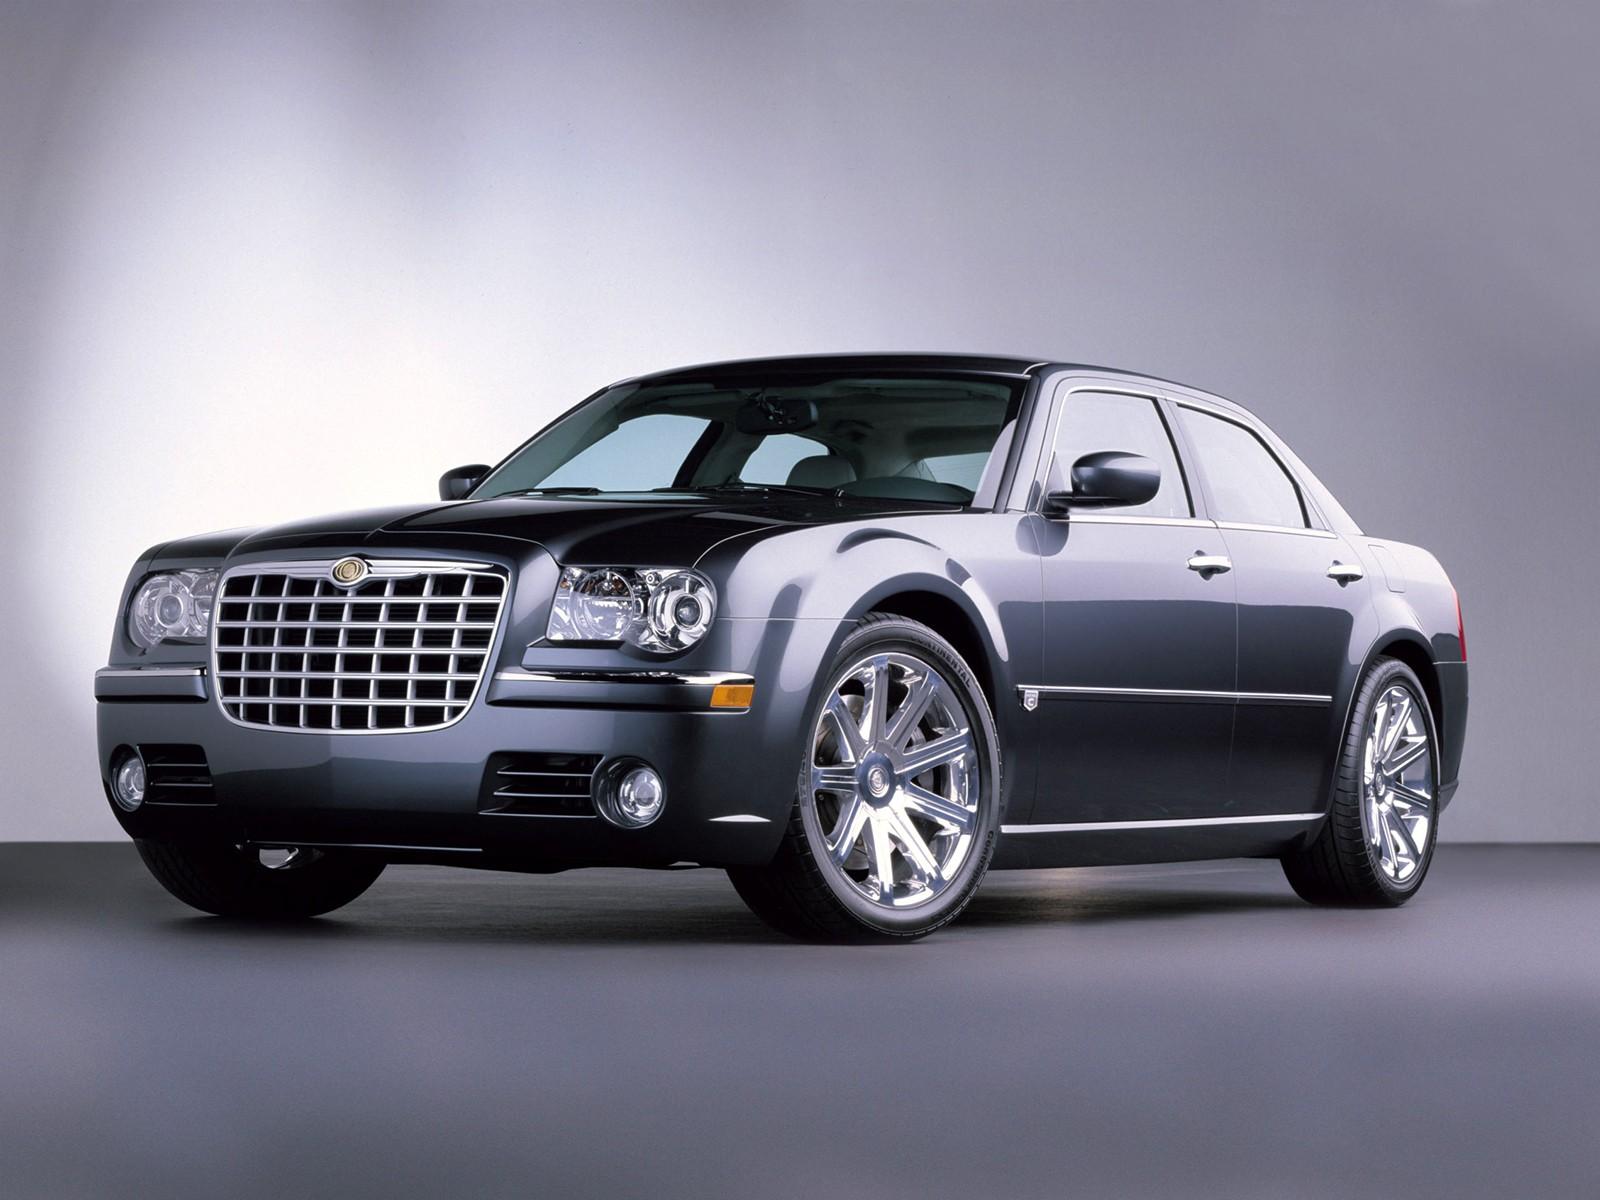 Premier Tuning Chrysler Voyager 300cc